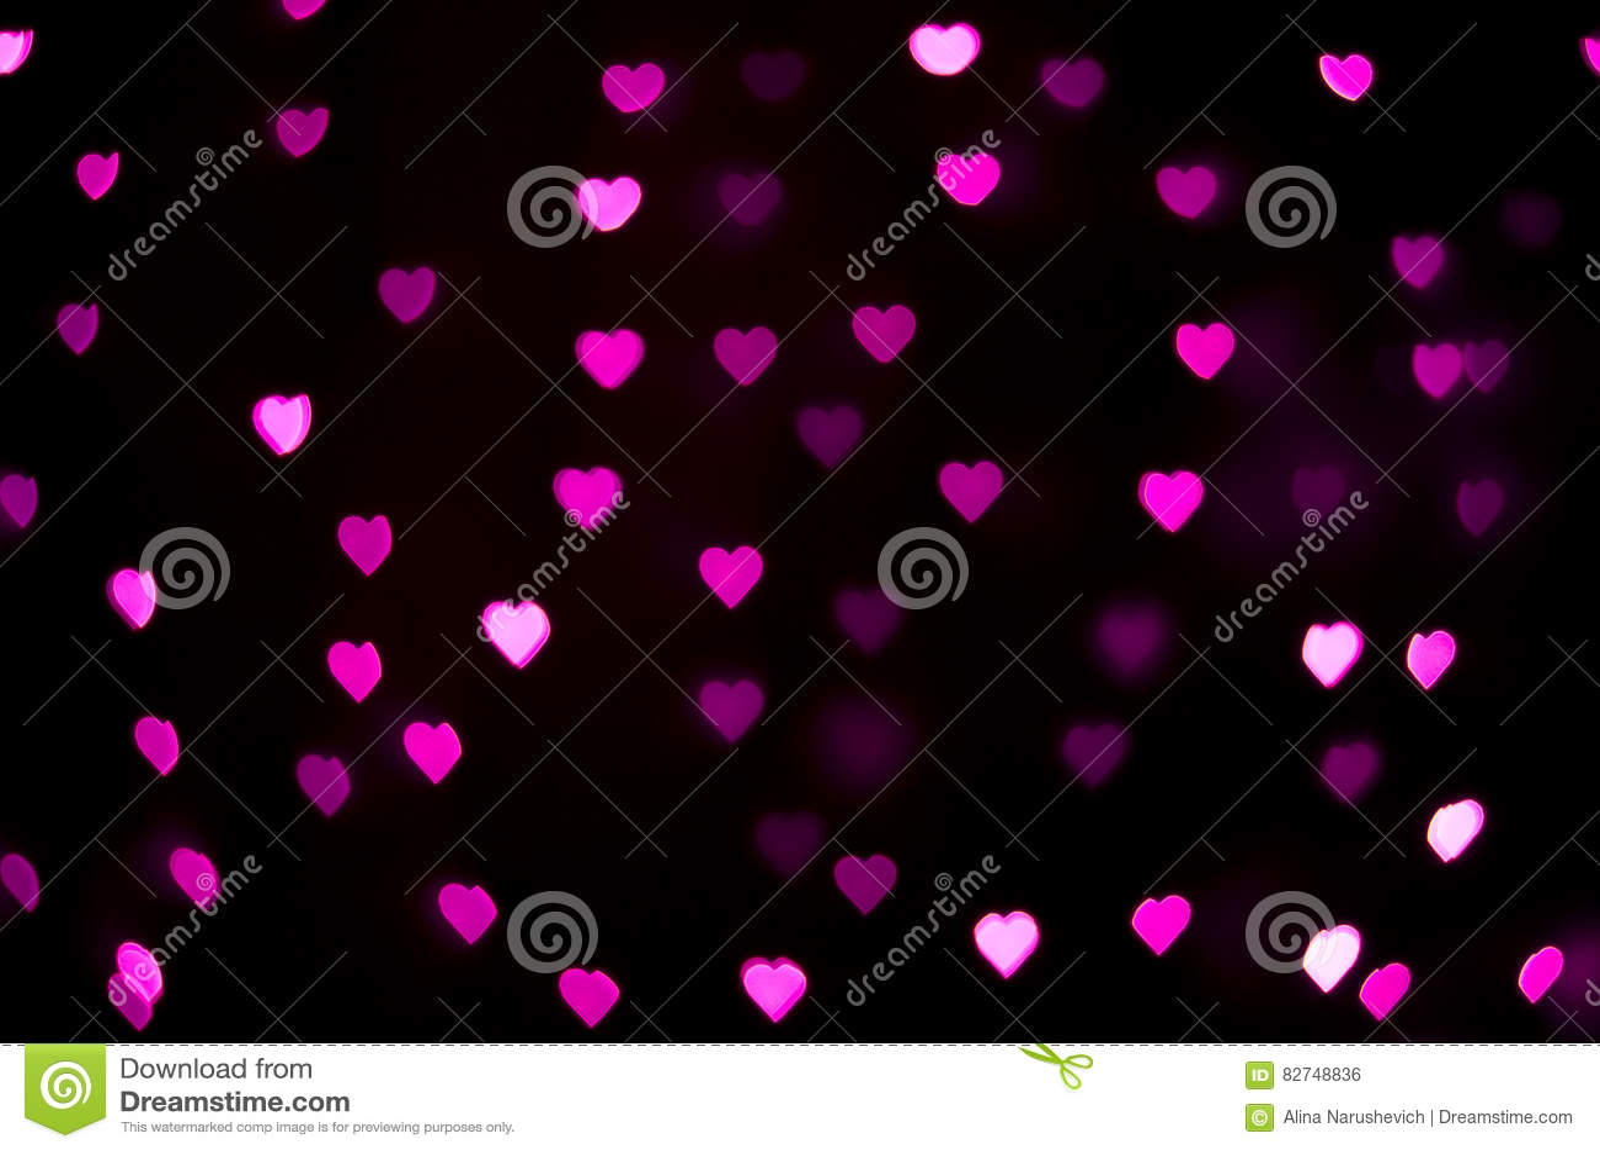 Abstract - blur pink heart lights - love sign